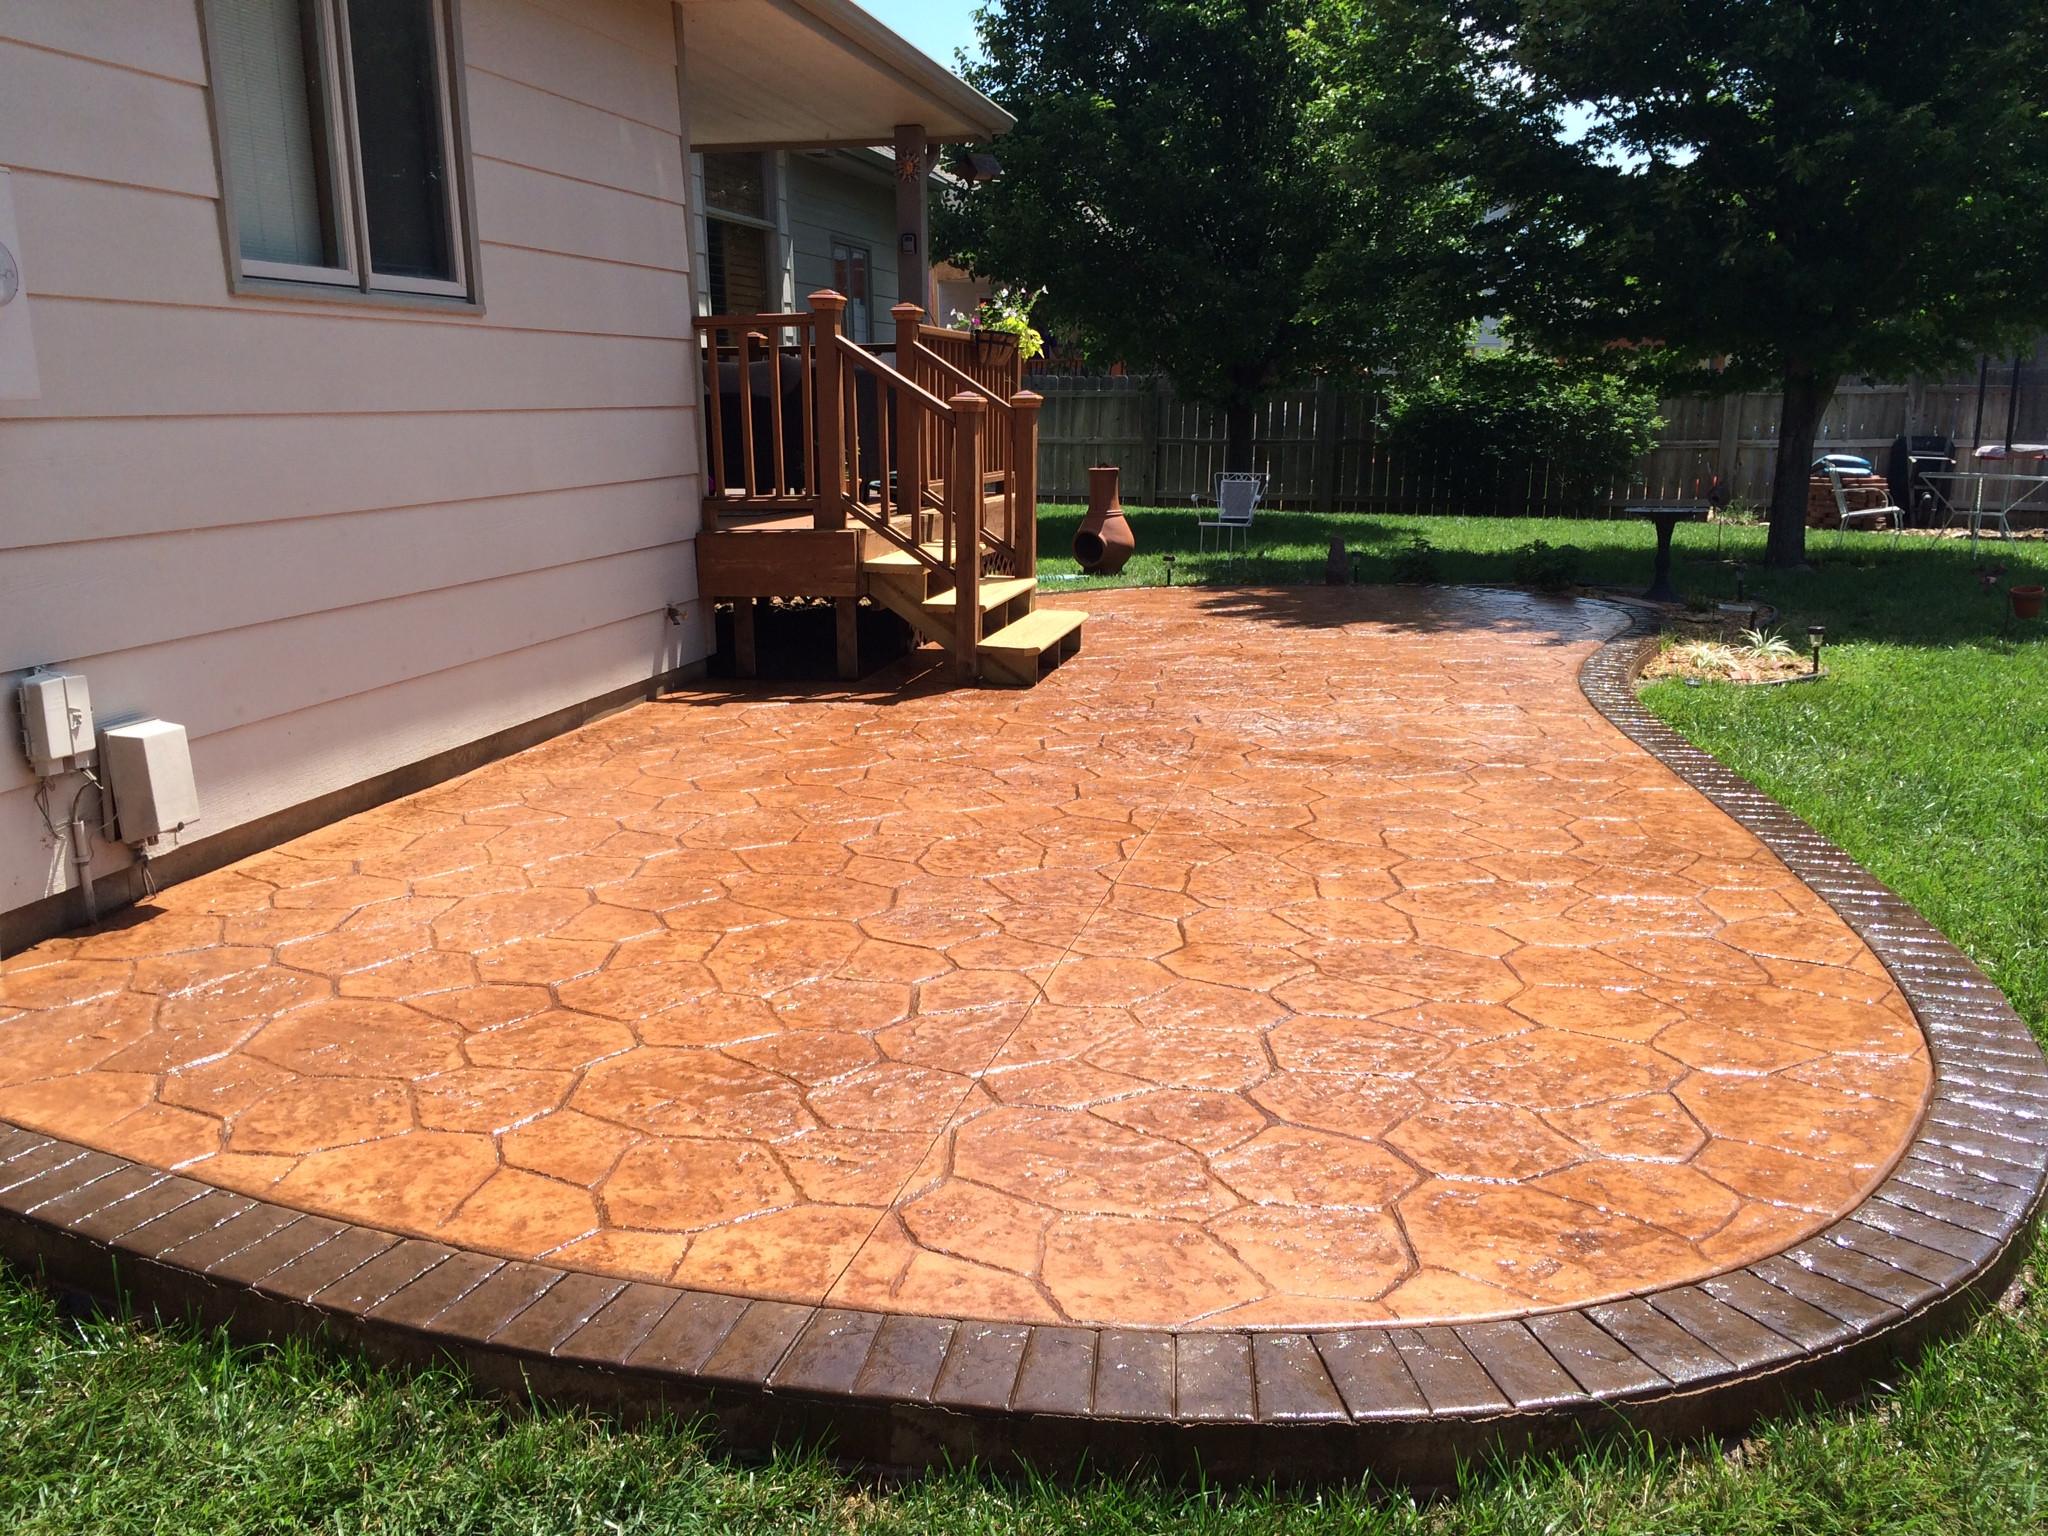 Backyard Patio Paver Design Ideas  Patio Pavers can transform your backyard